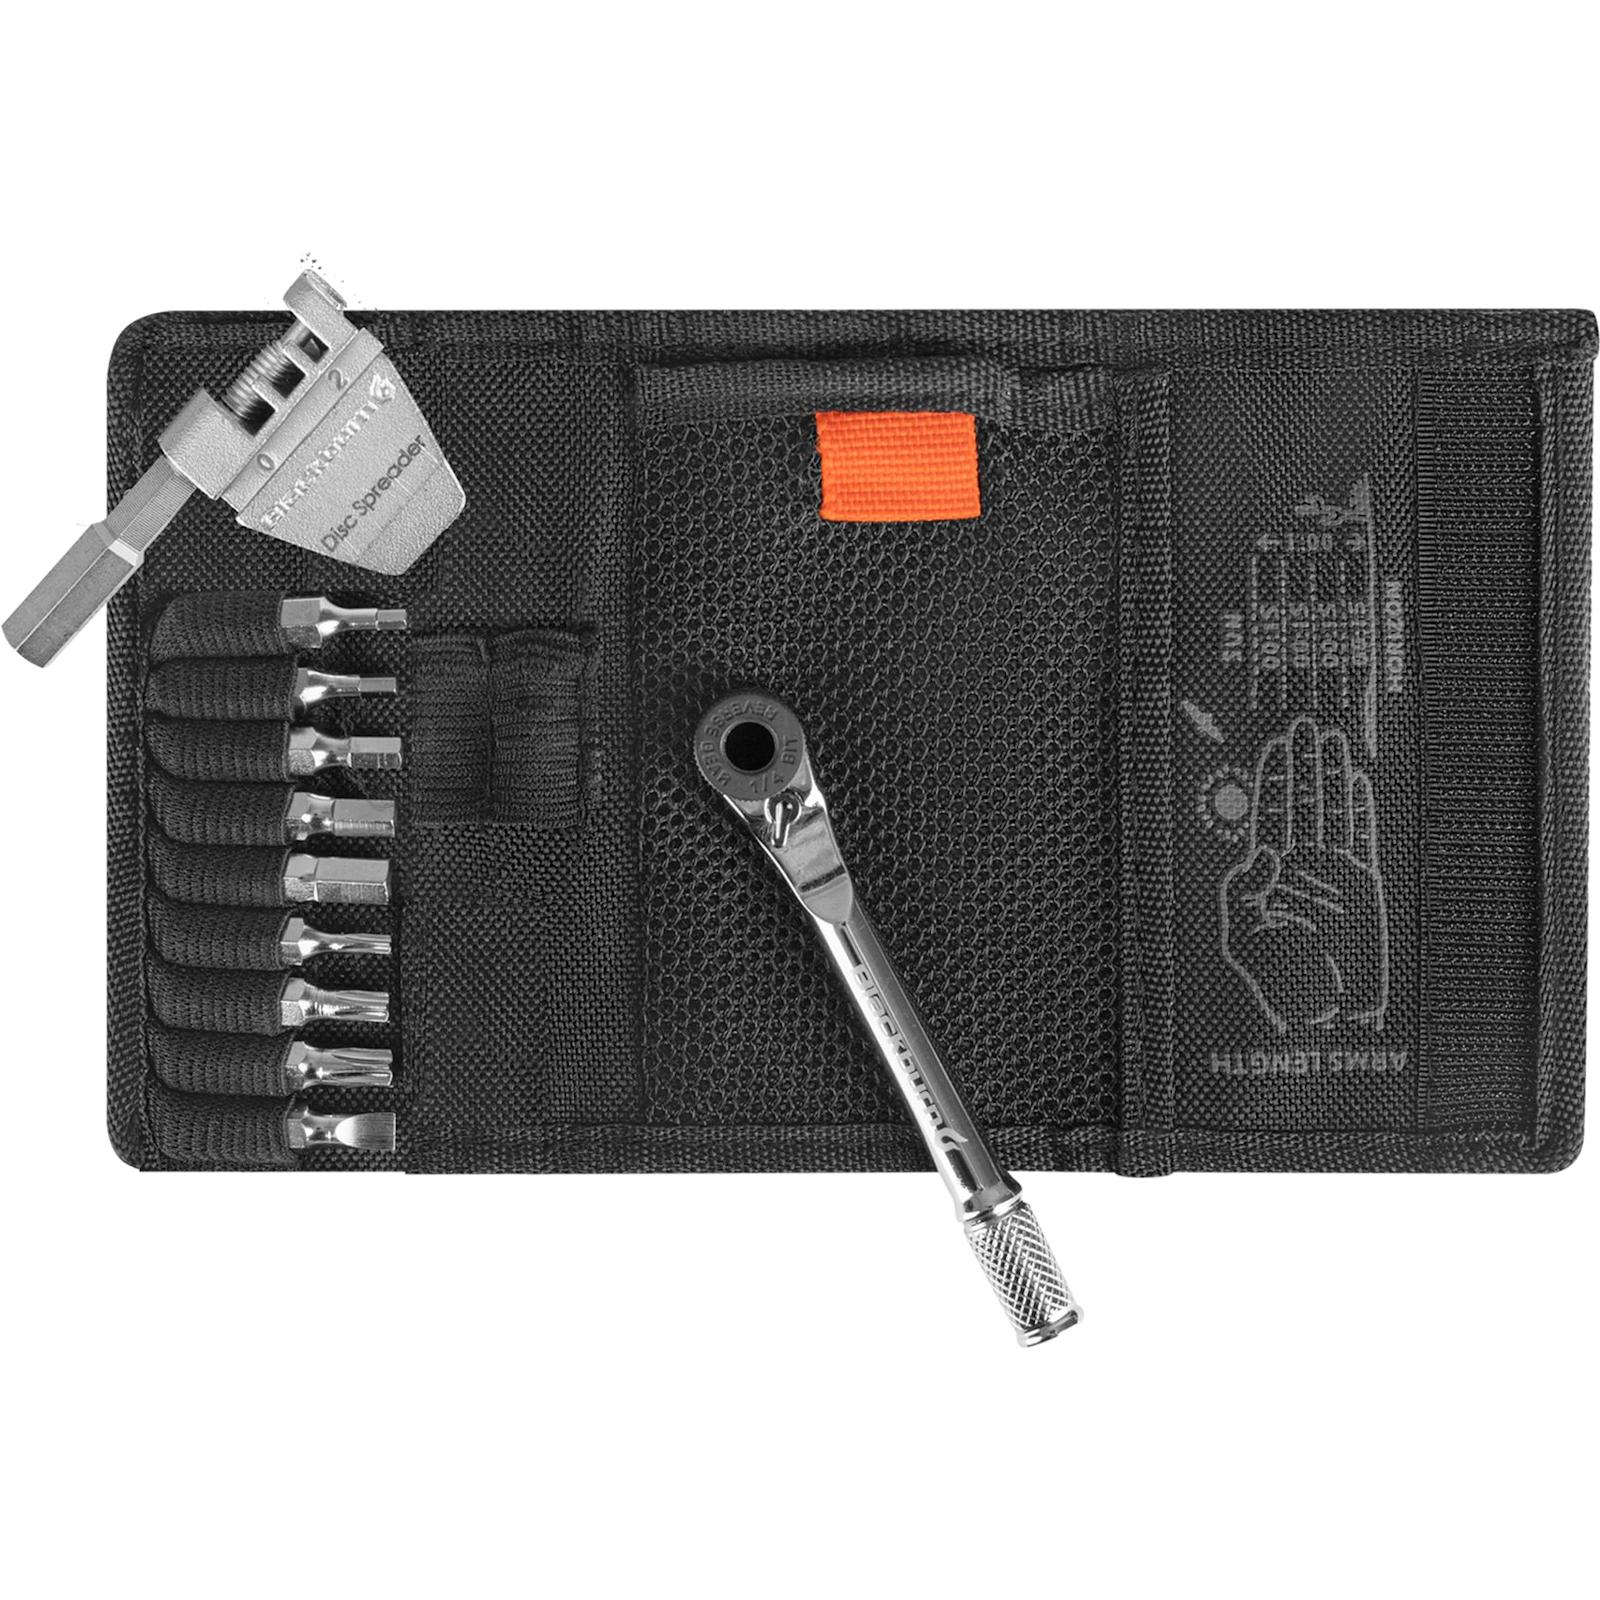 Image of Blackburn Big Switch Ratchet Multi-Tool